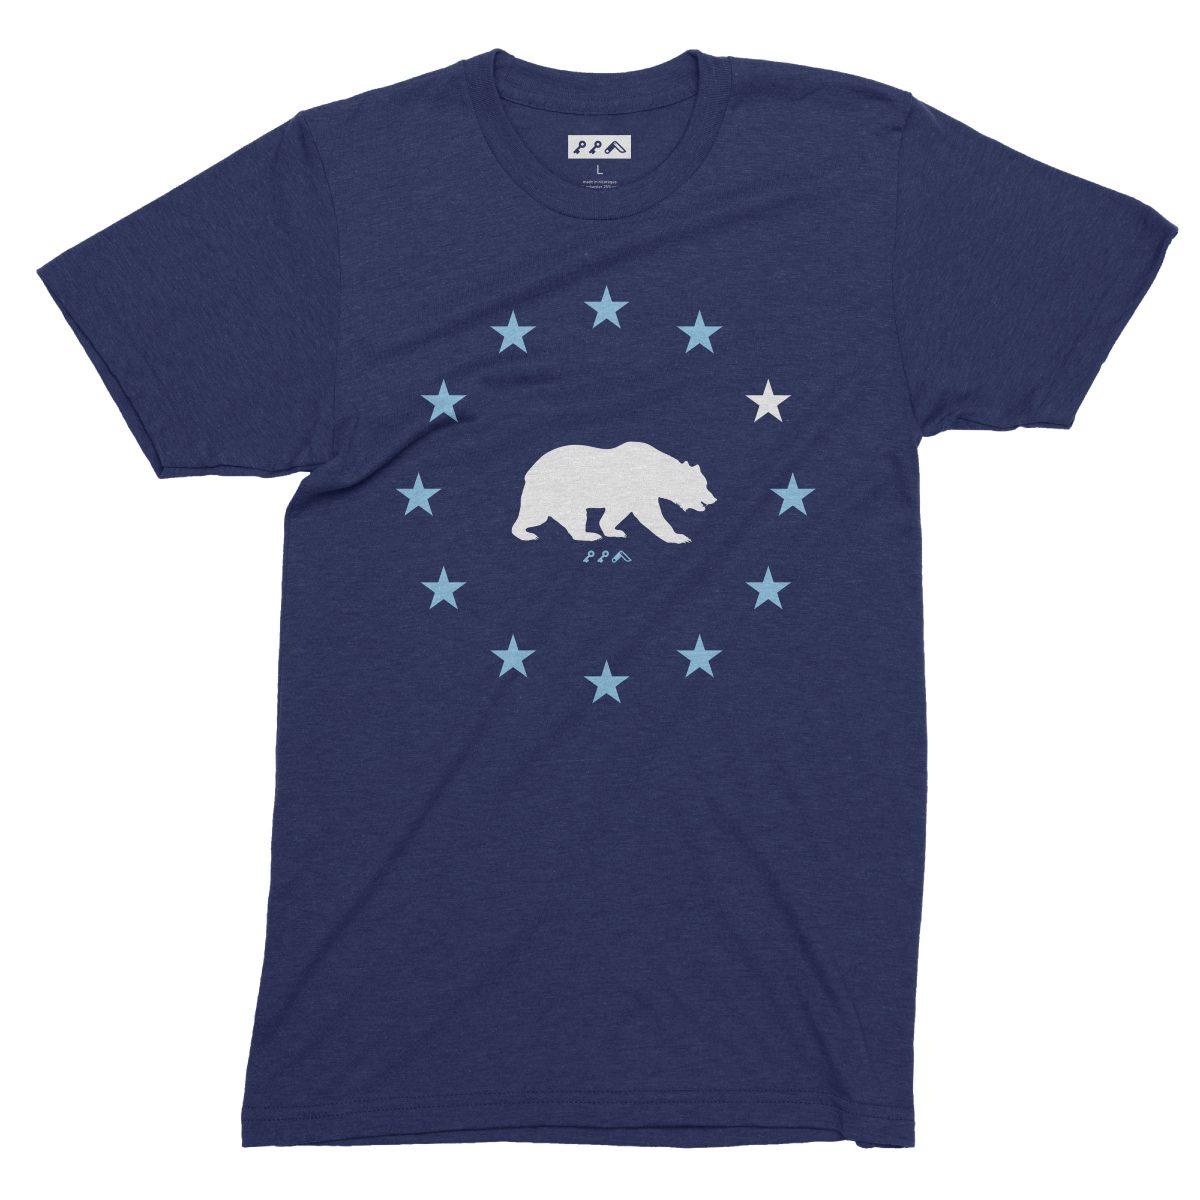 STAR GAZING california republic cal bears tees in navy